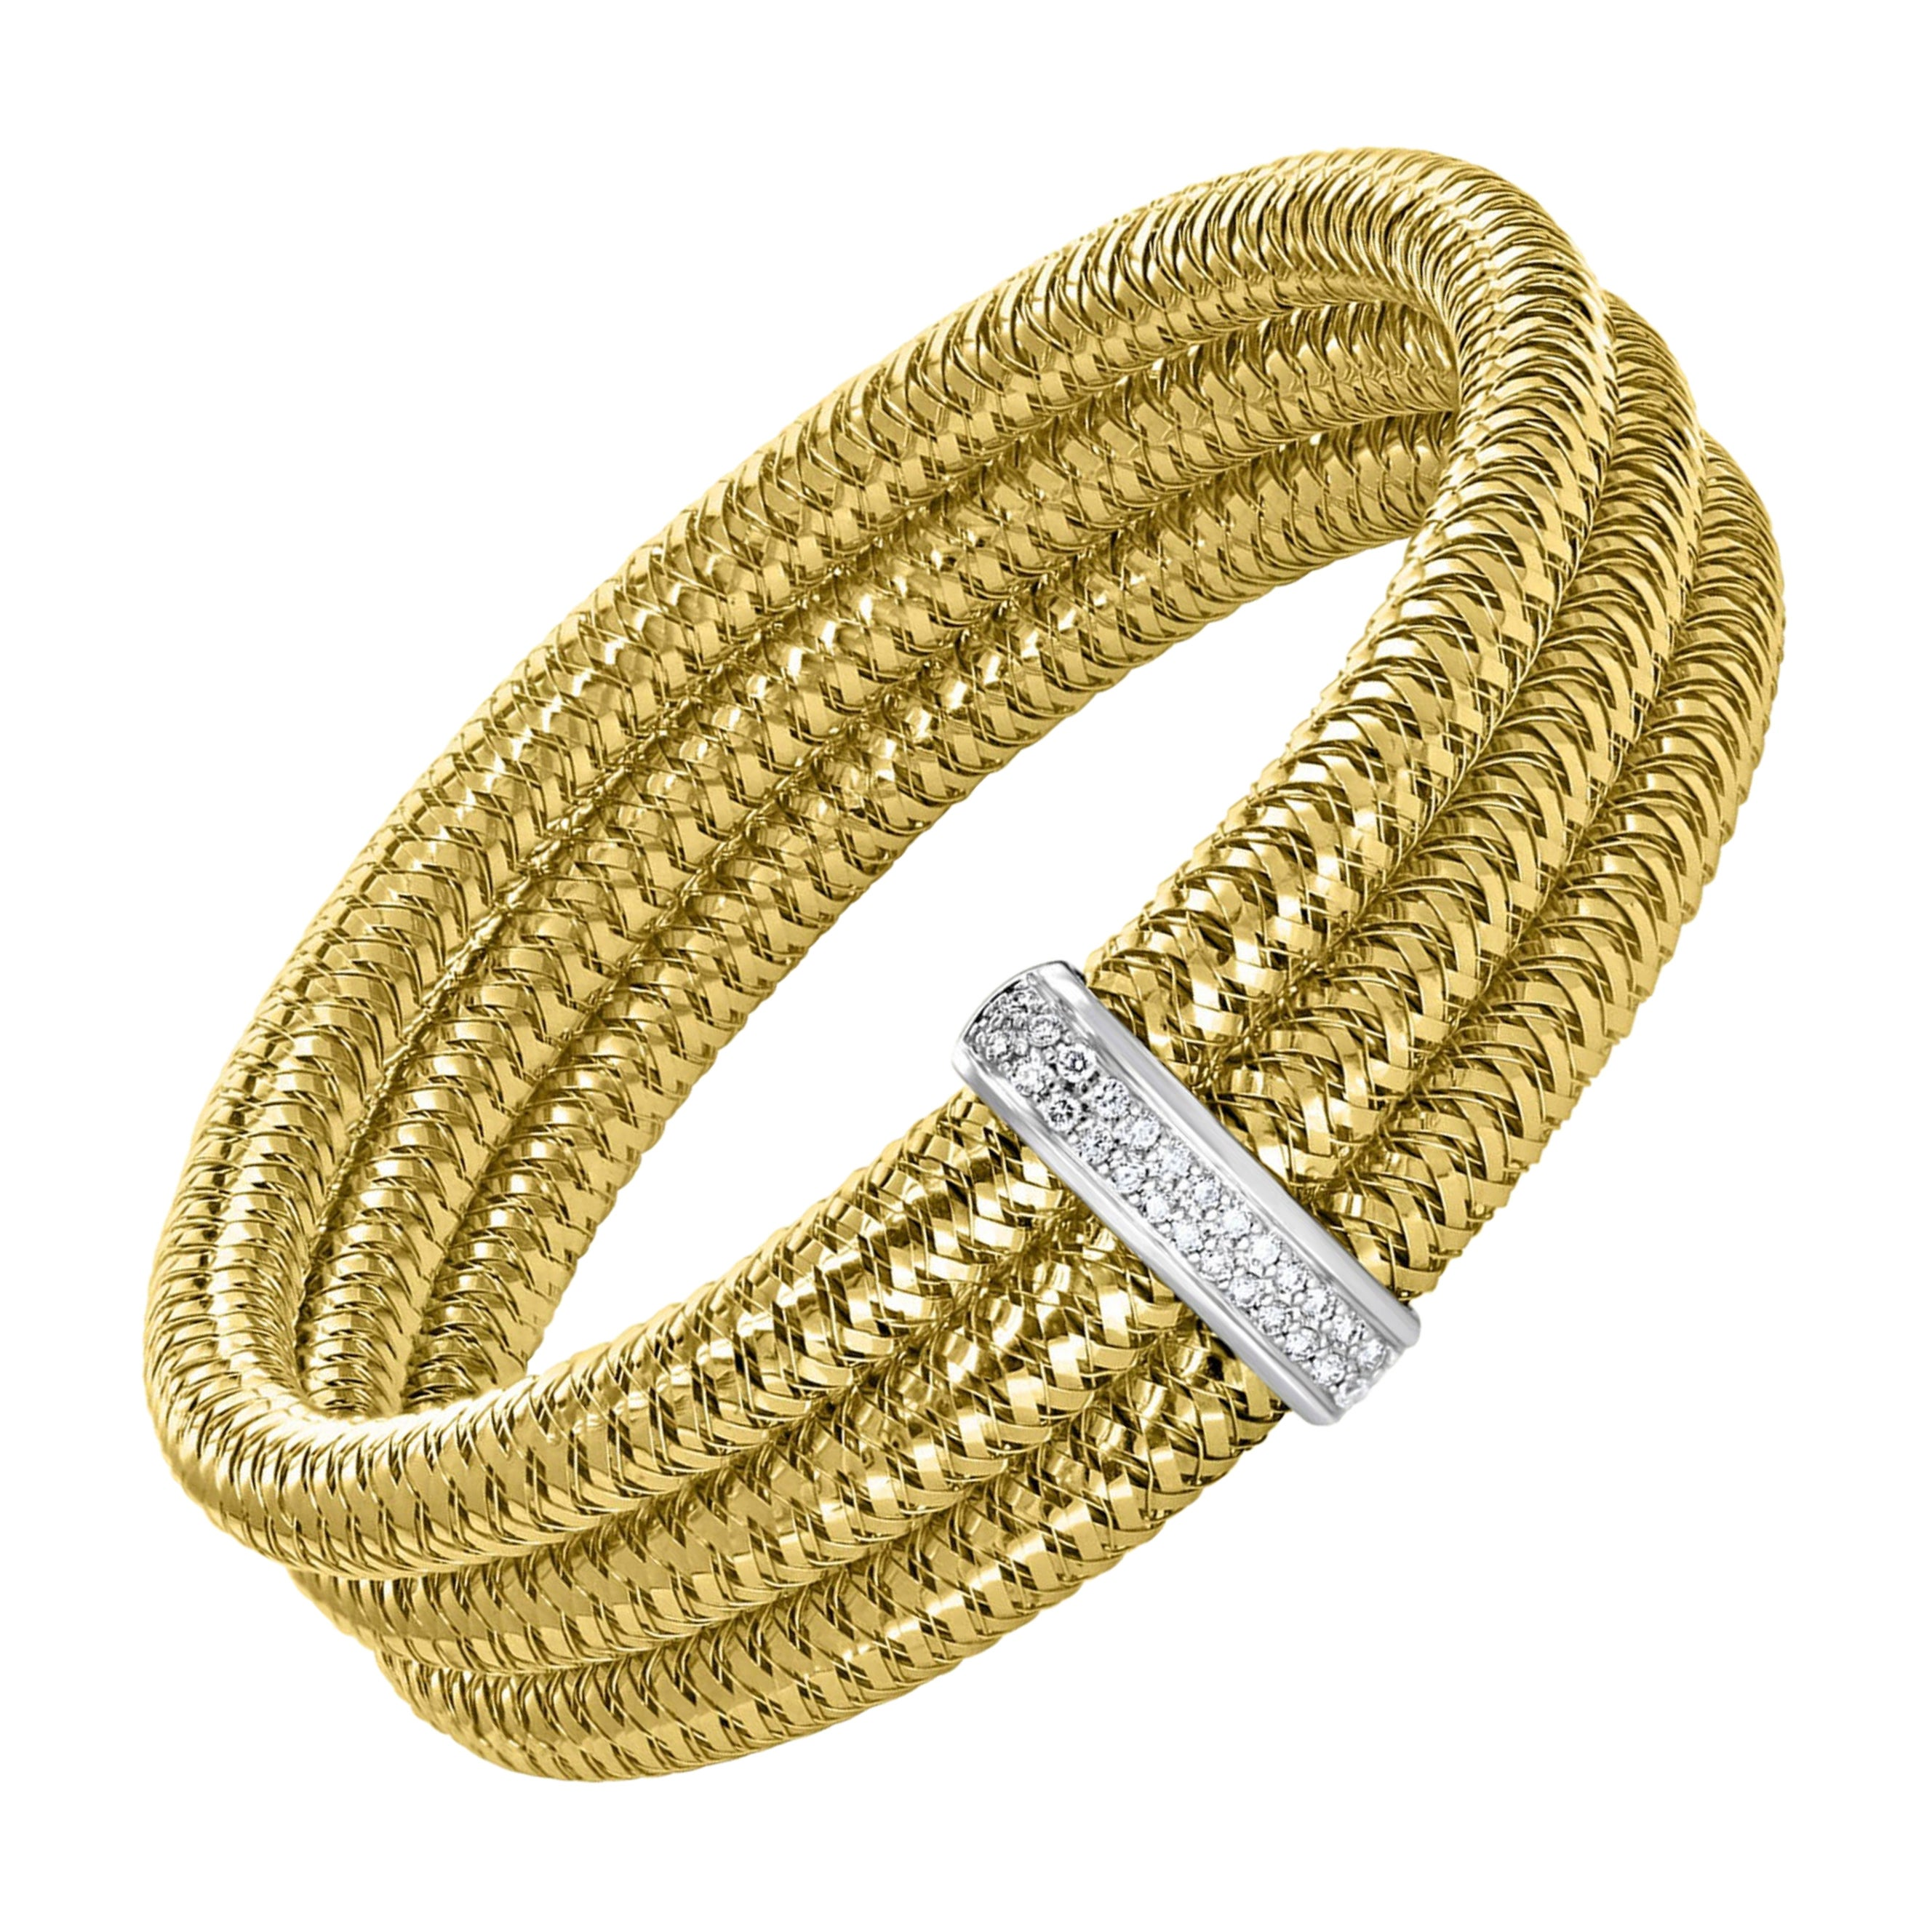 Roberto Coin Diamond Bangle Three-Row Bracelet in 18 Karat Yellow Gold Estate